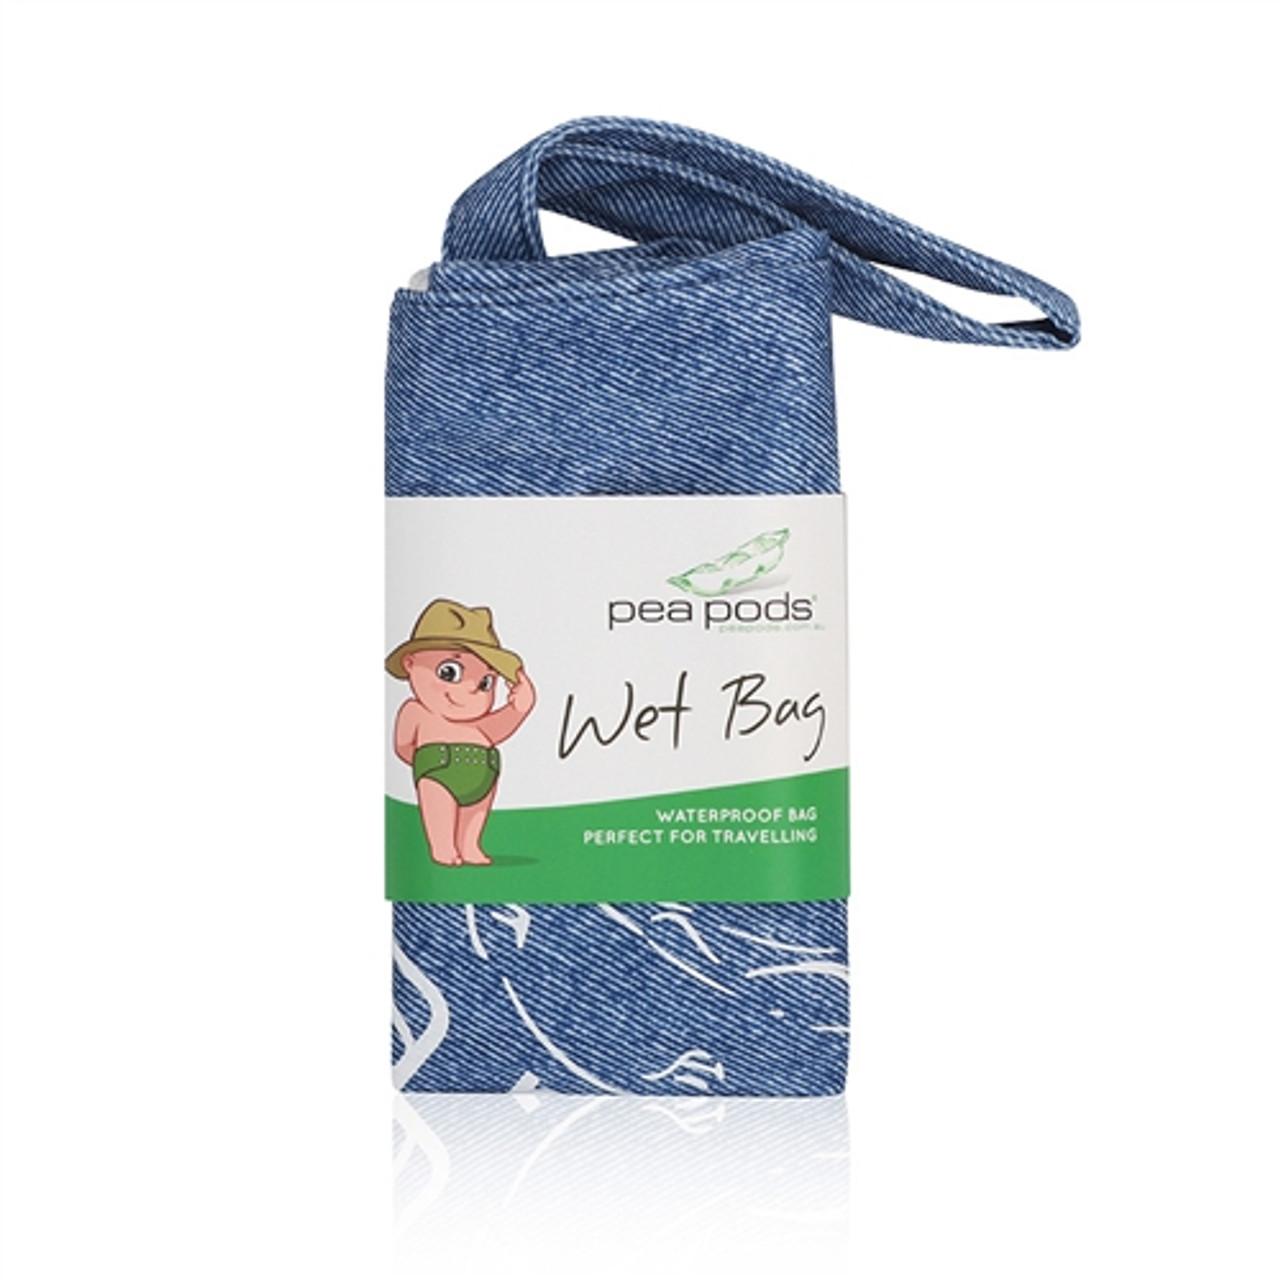 Wet-Bag-Denim-Packaging